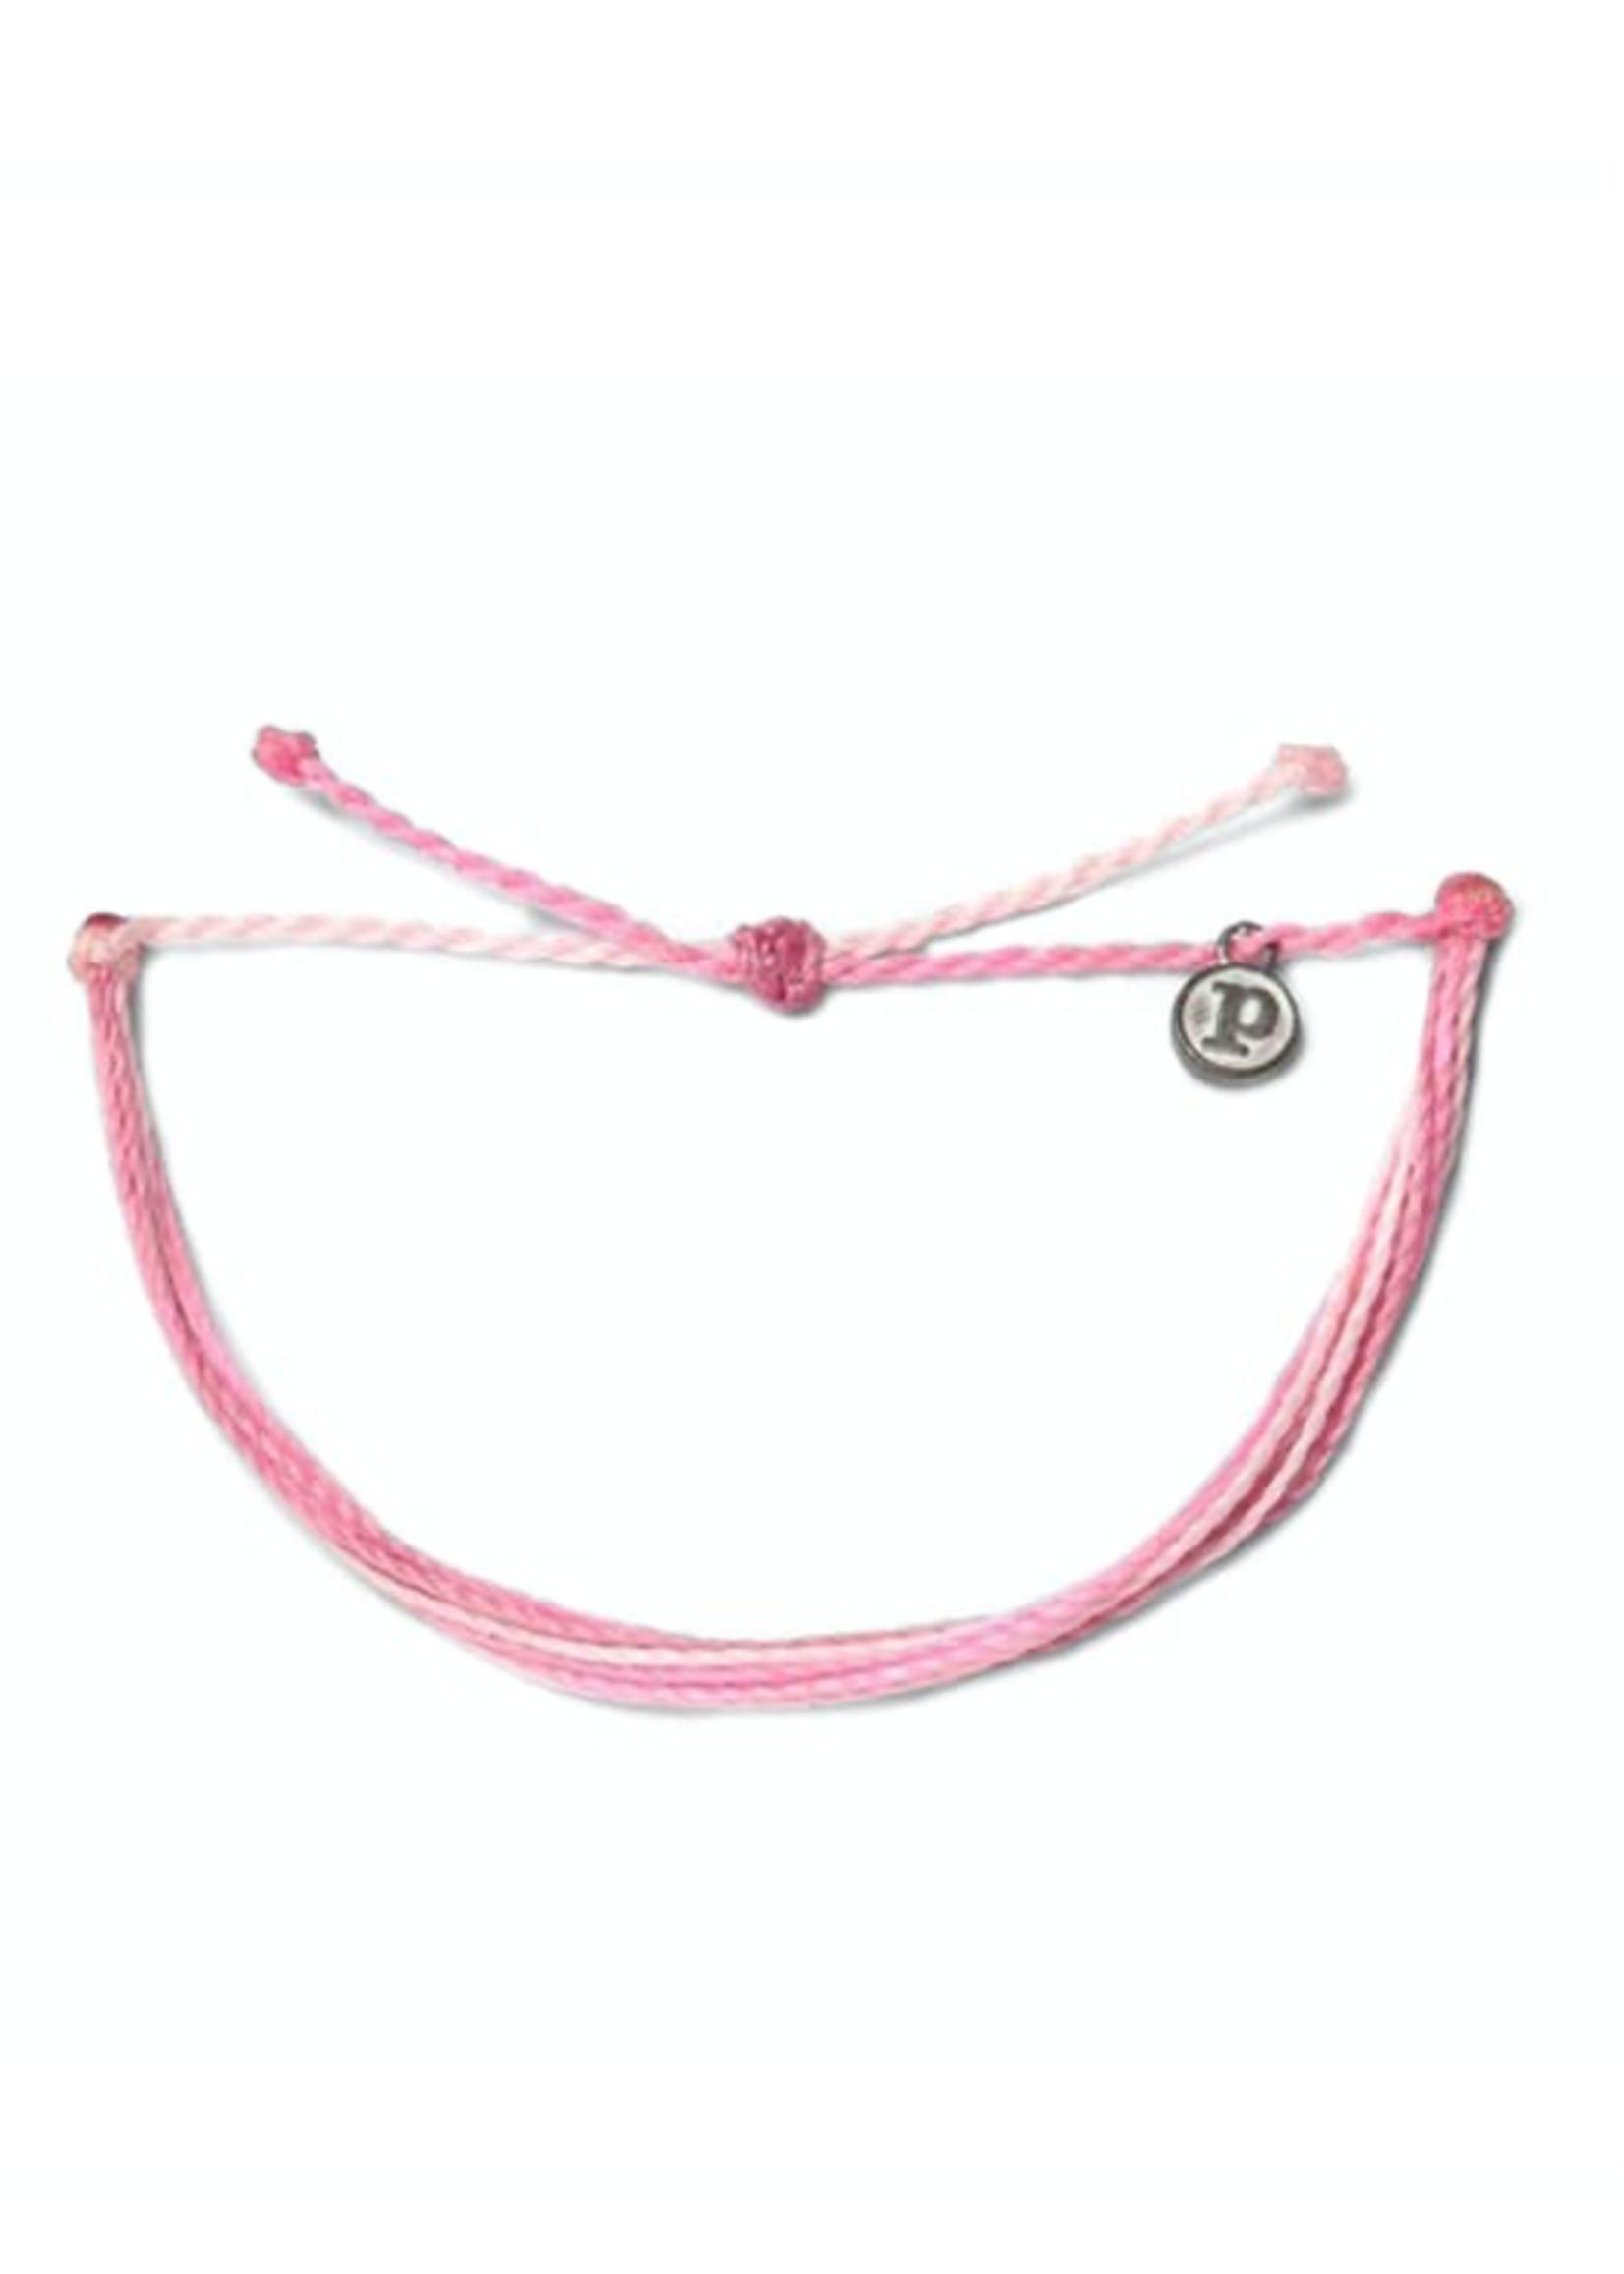 Pura Vida Armband rose - Boarding voor Breast Cancer